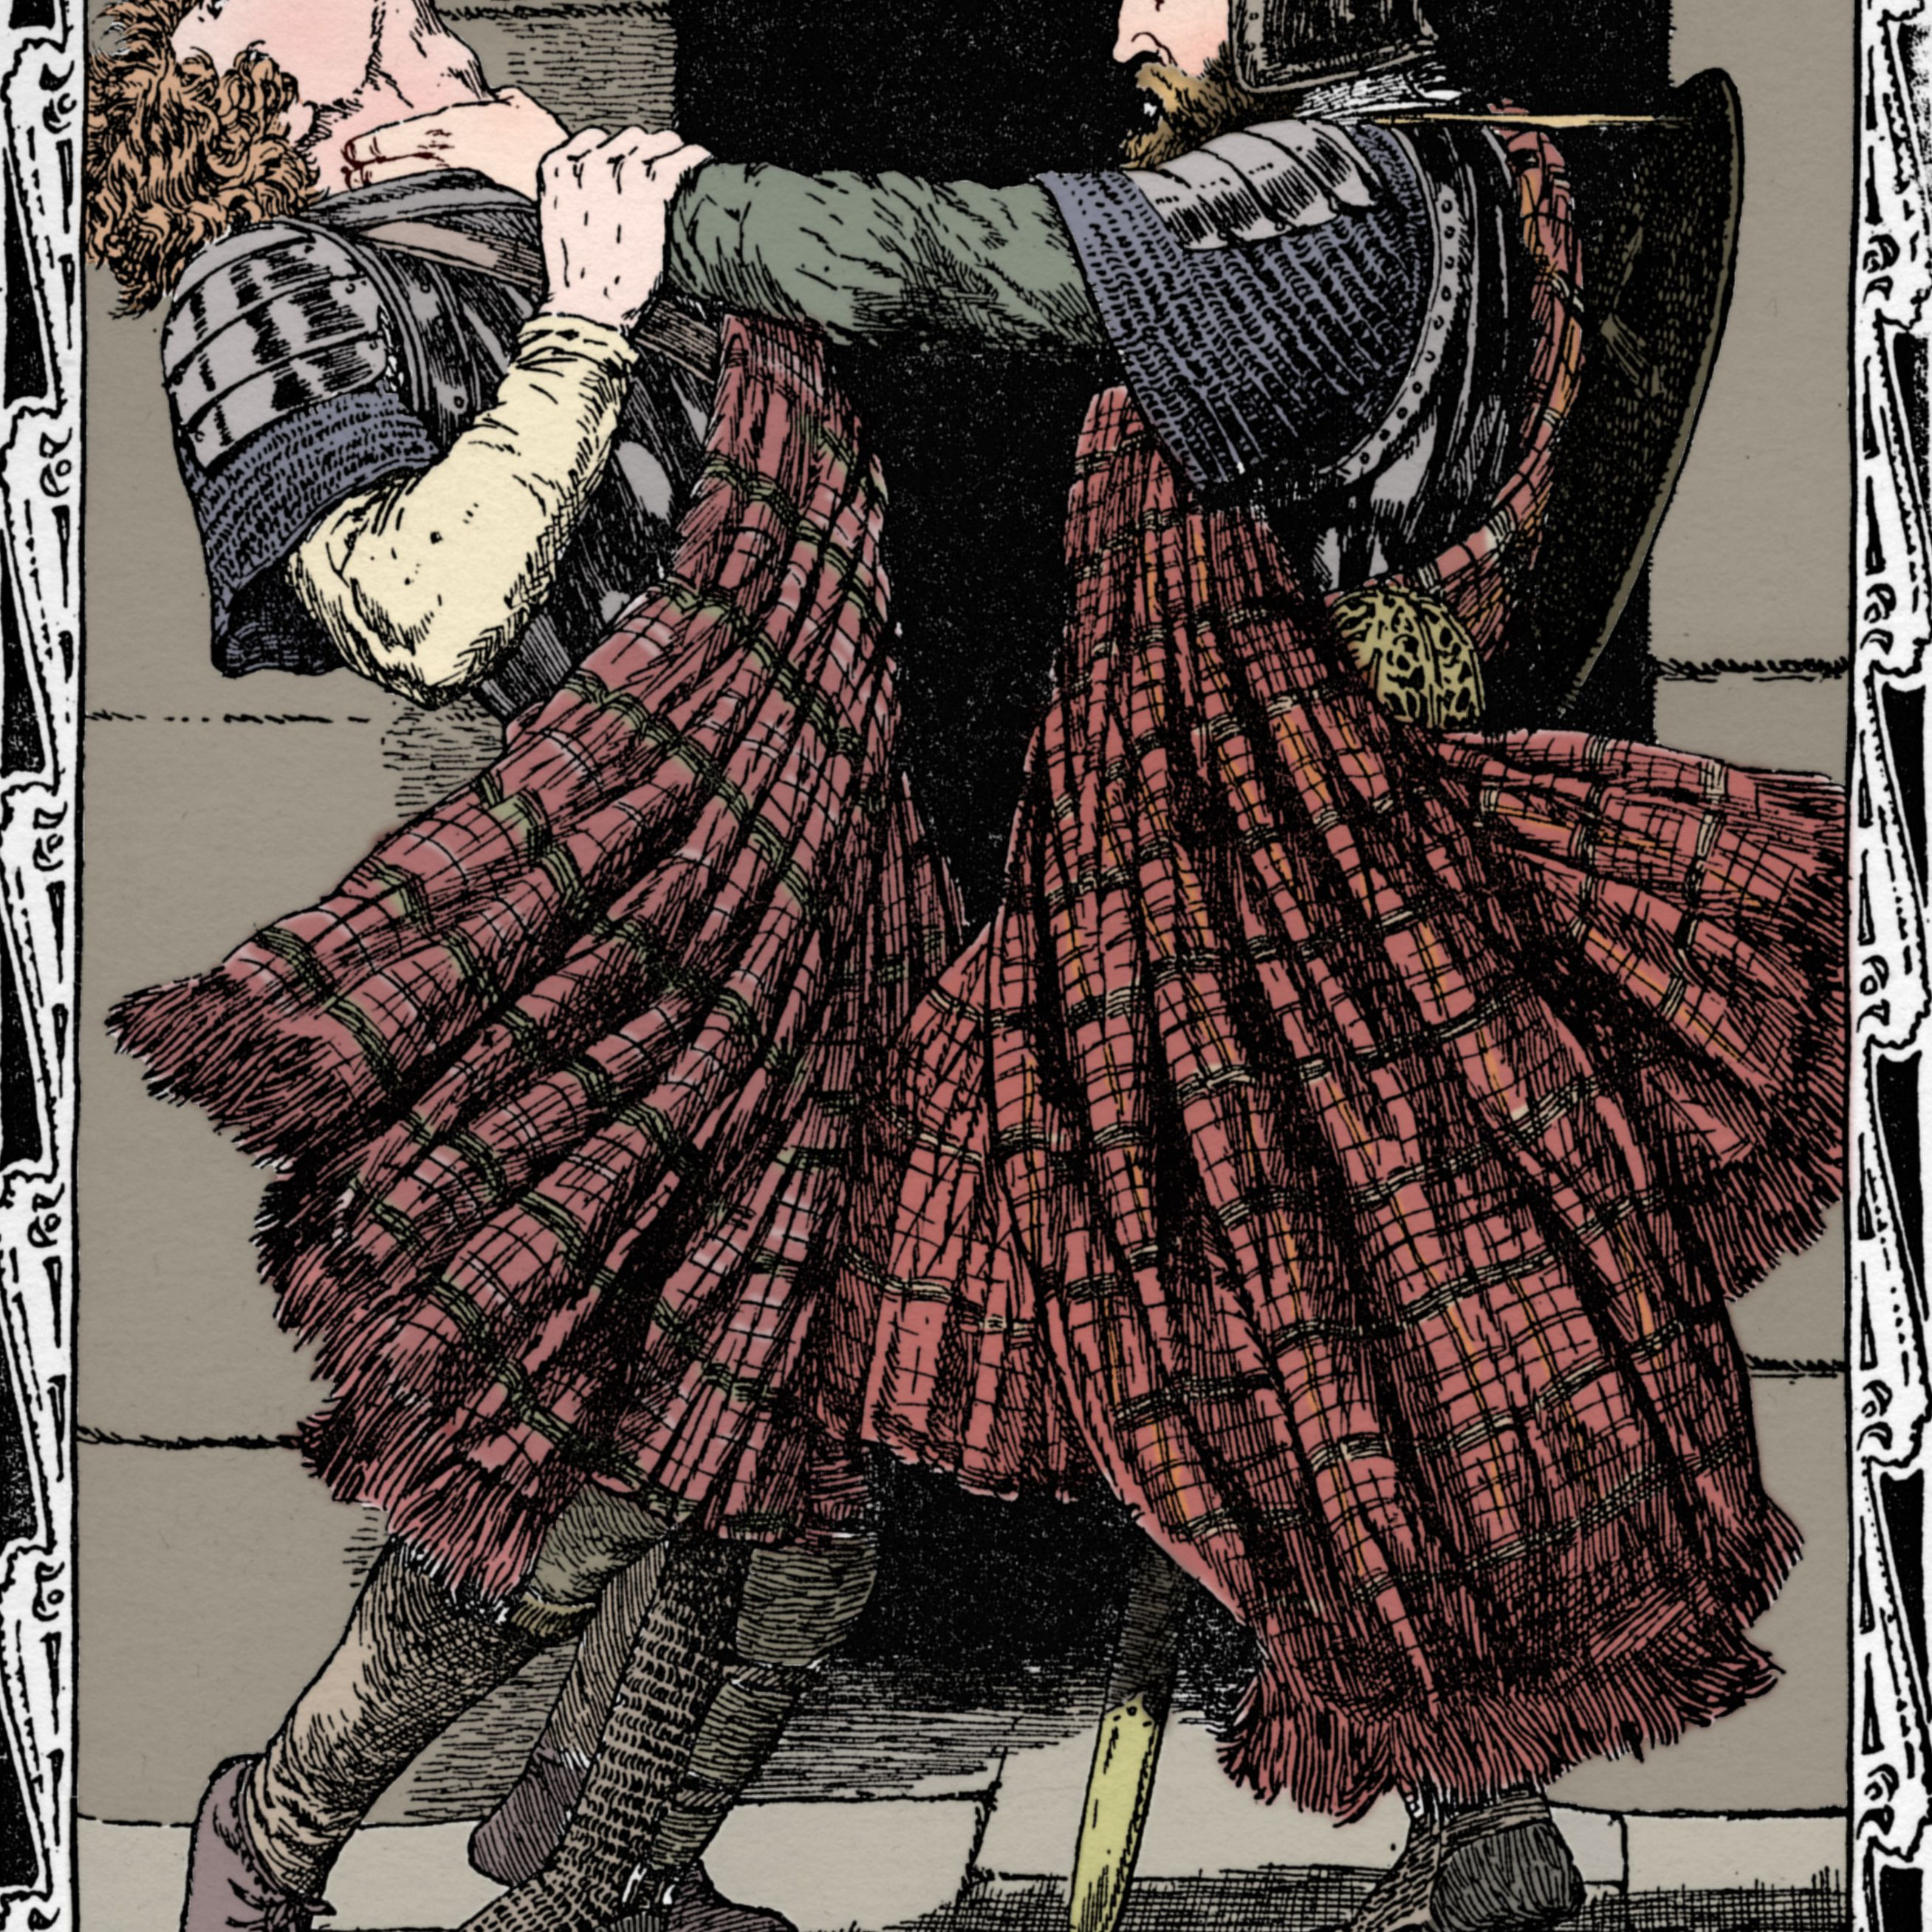 Robert the Bruce: Scotland's Warrior King